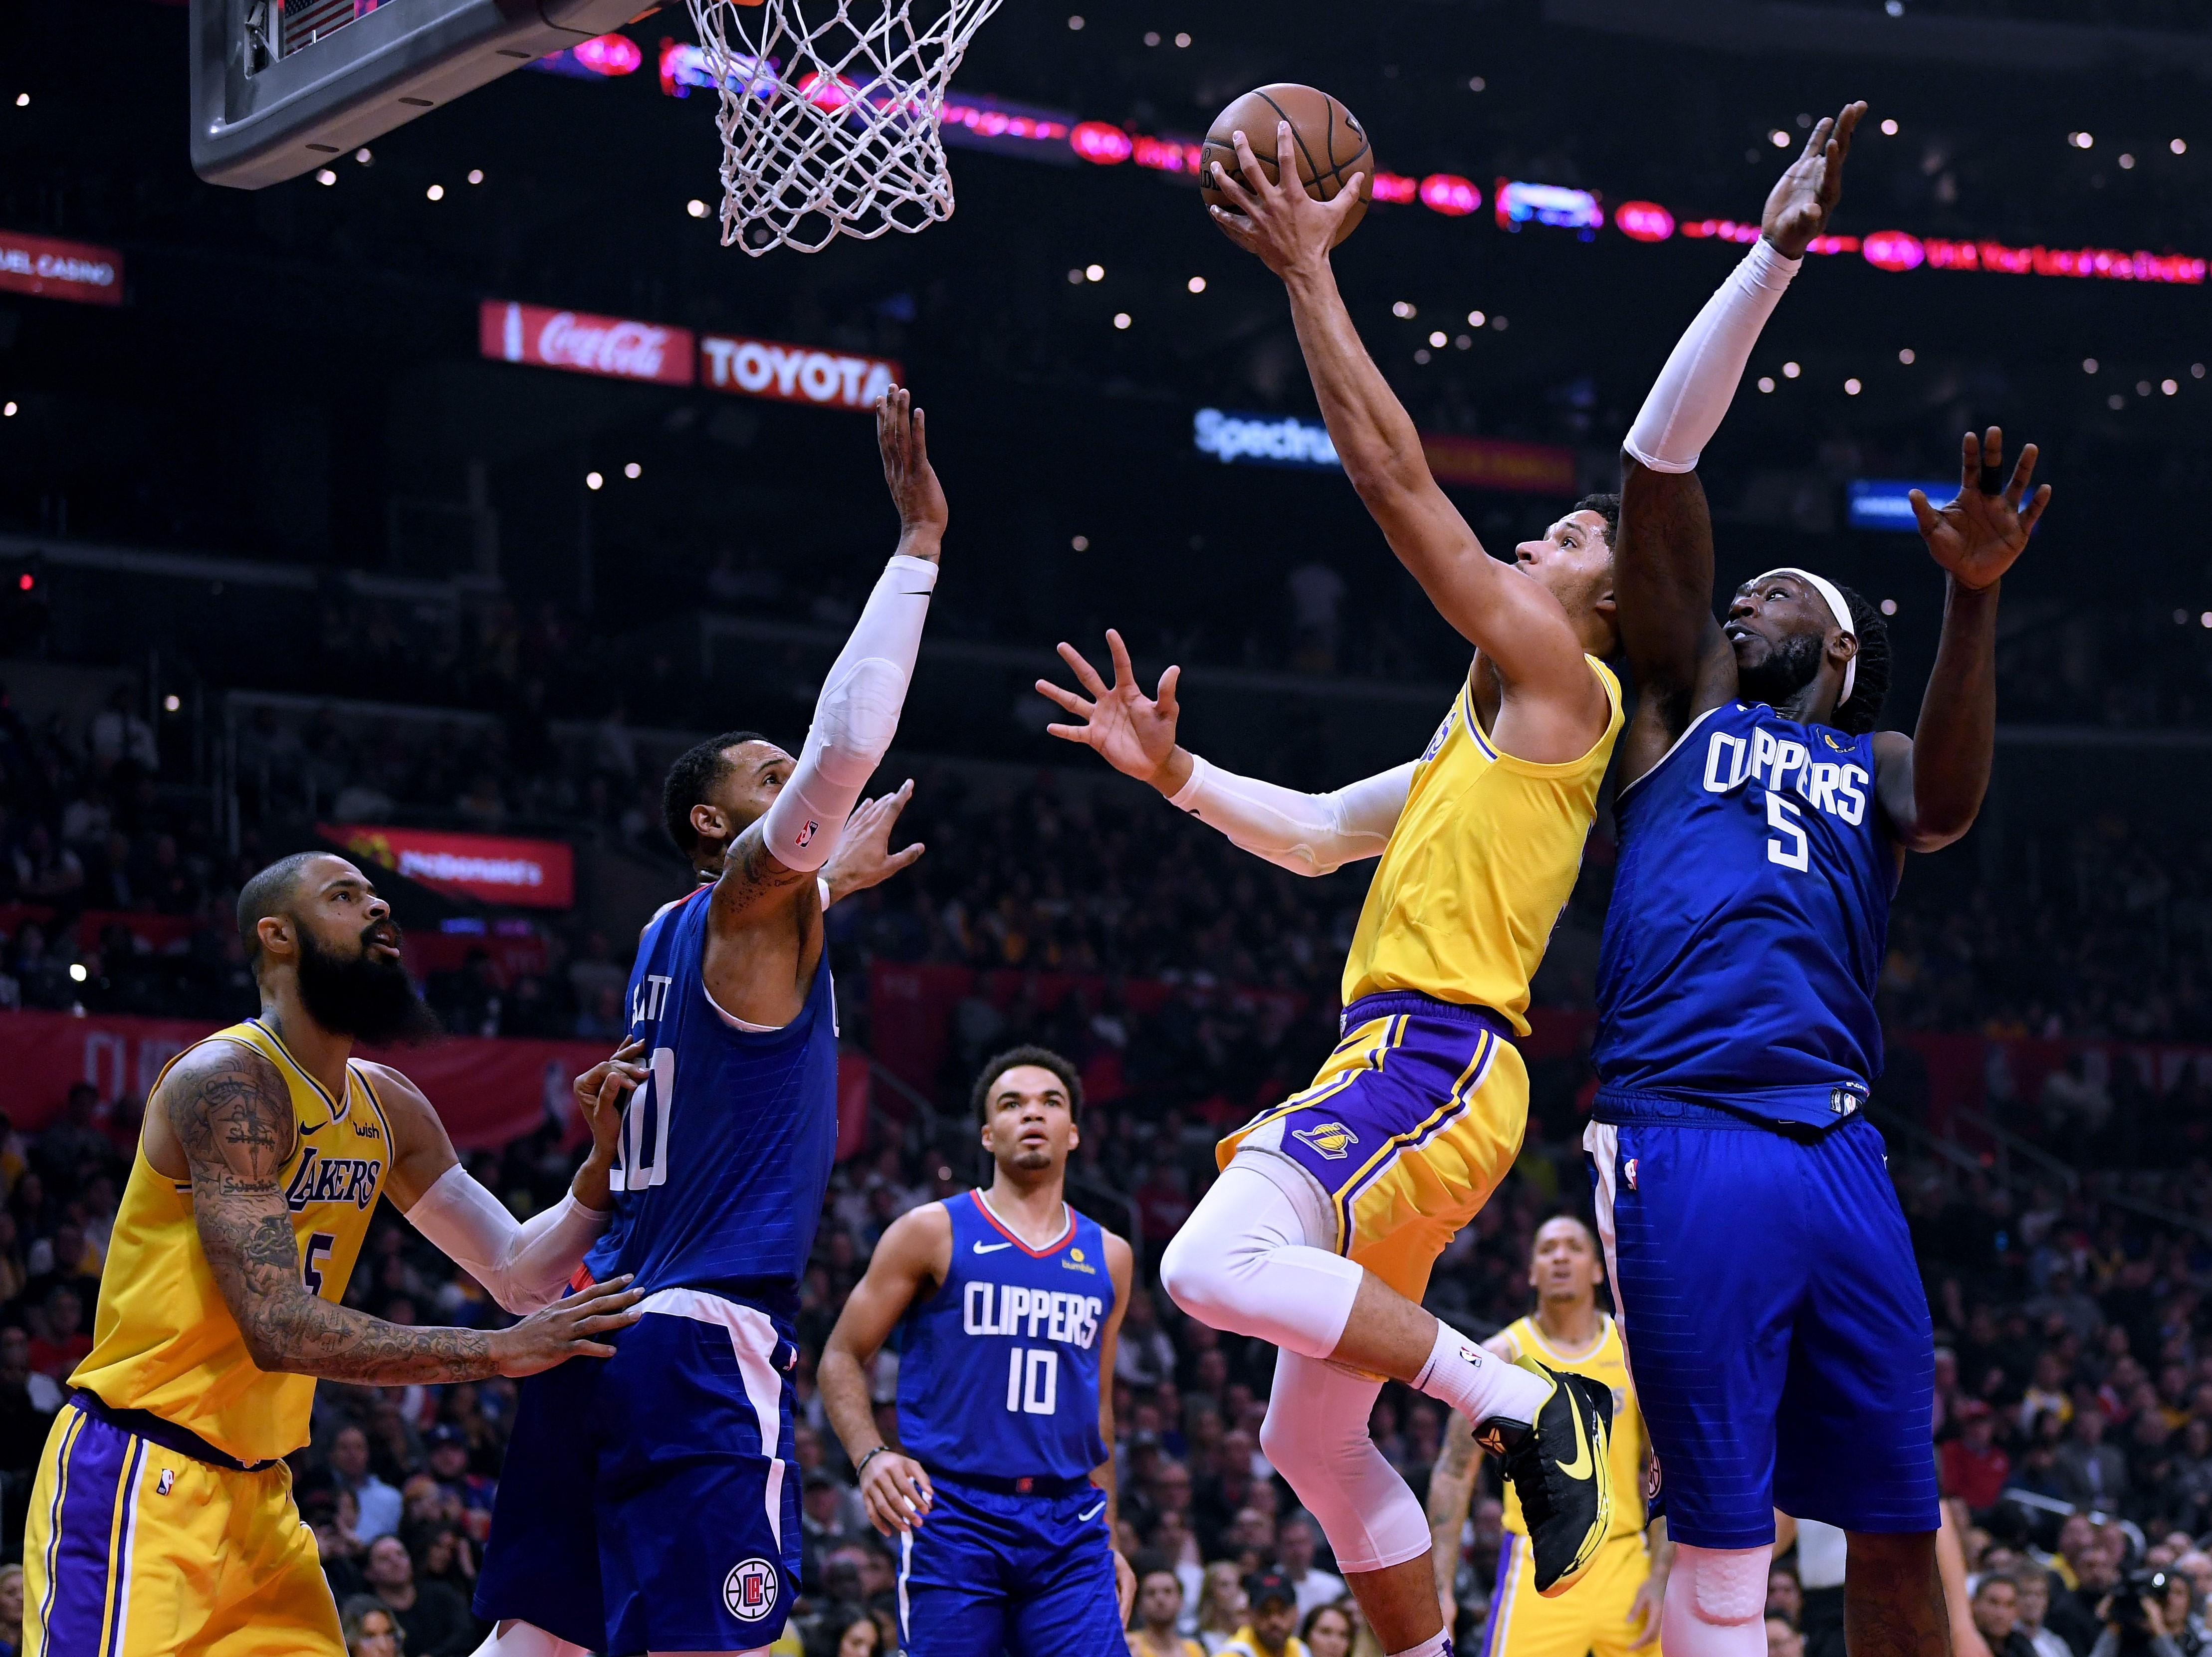 Josh Hart lors de Los Angeles Lakers - LA Clippers en NBA le 31 janvier 2019